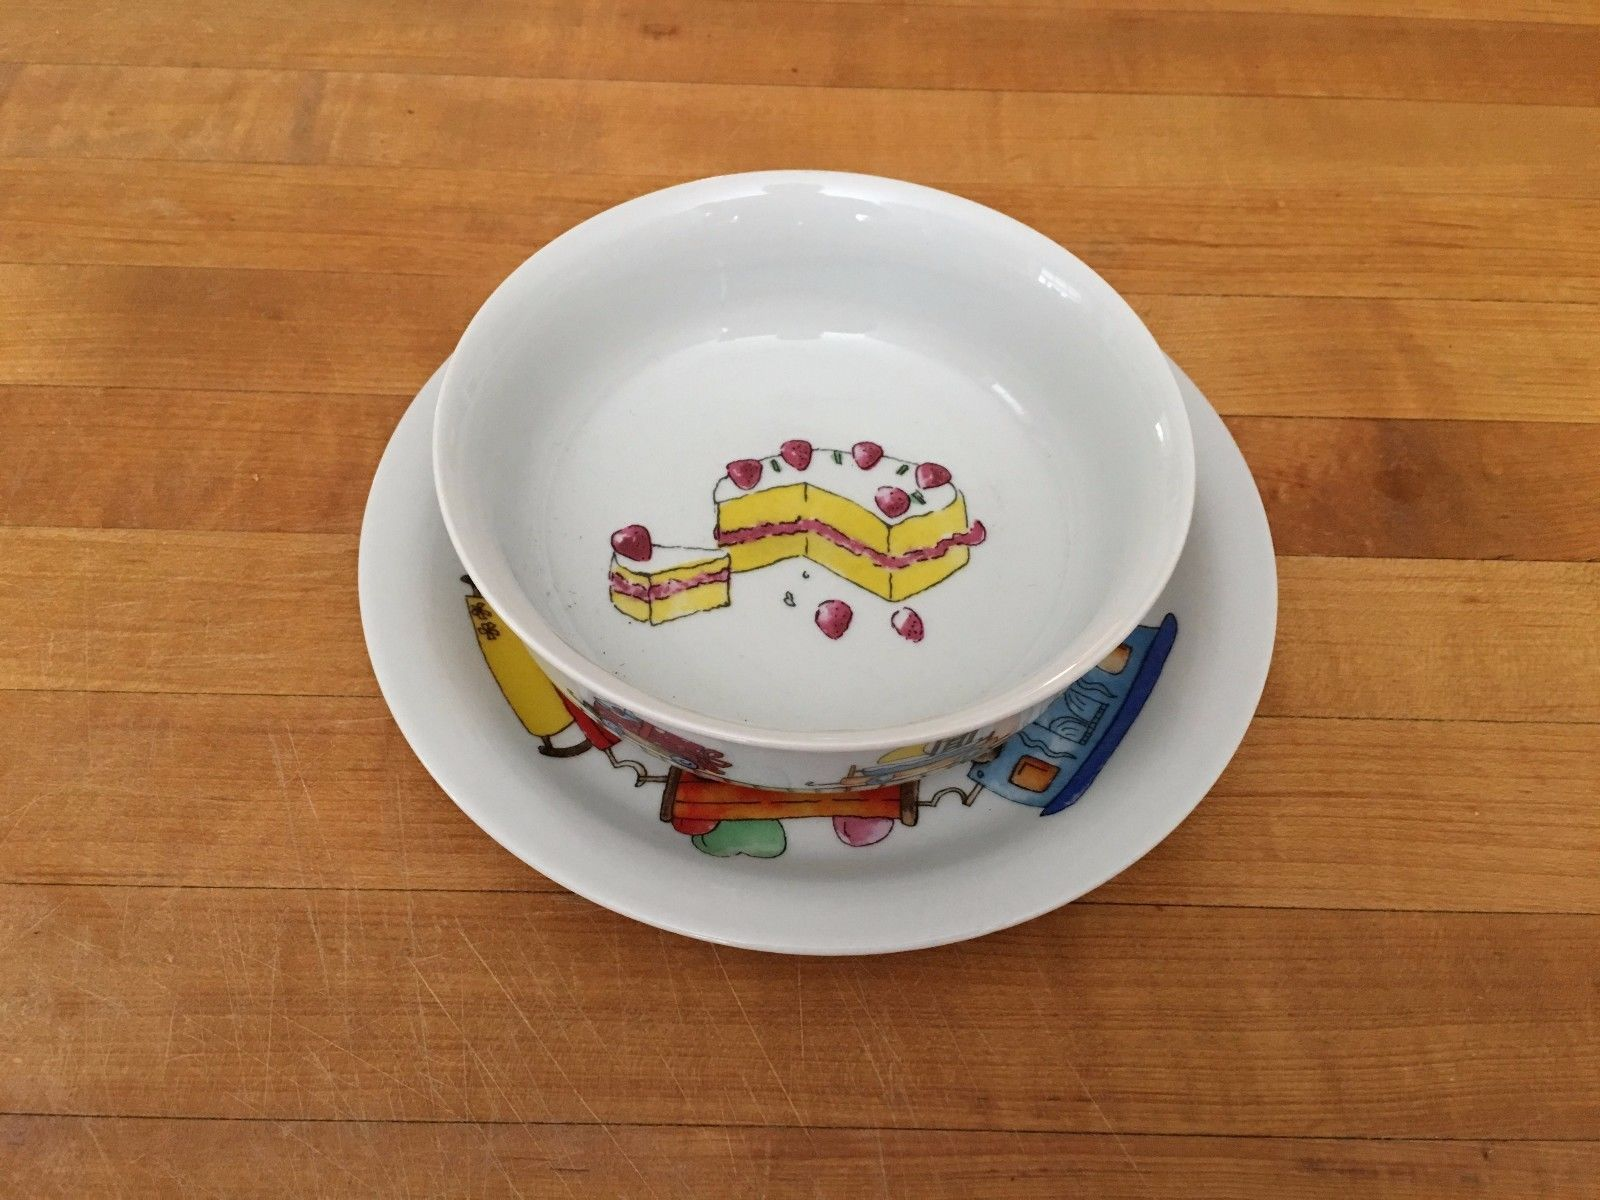 Birthday Bowl: Vardem Childrens Glass Pottery Birthday Bowl Plate Train